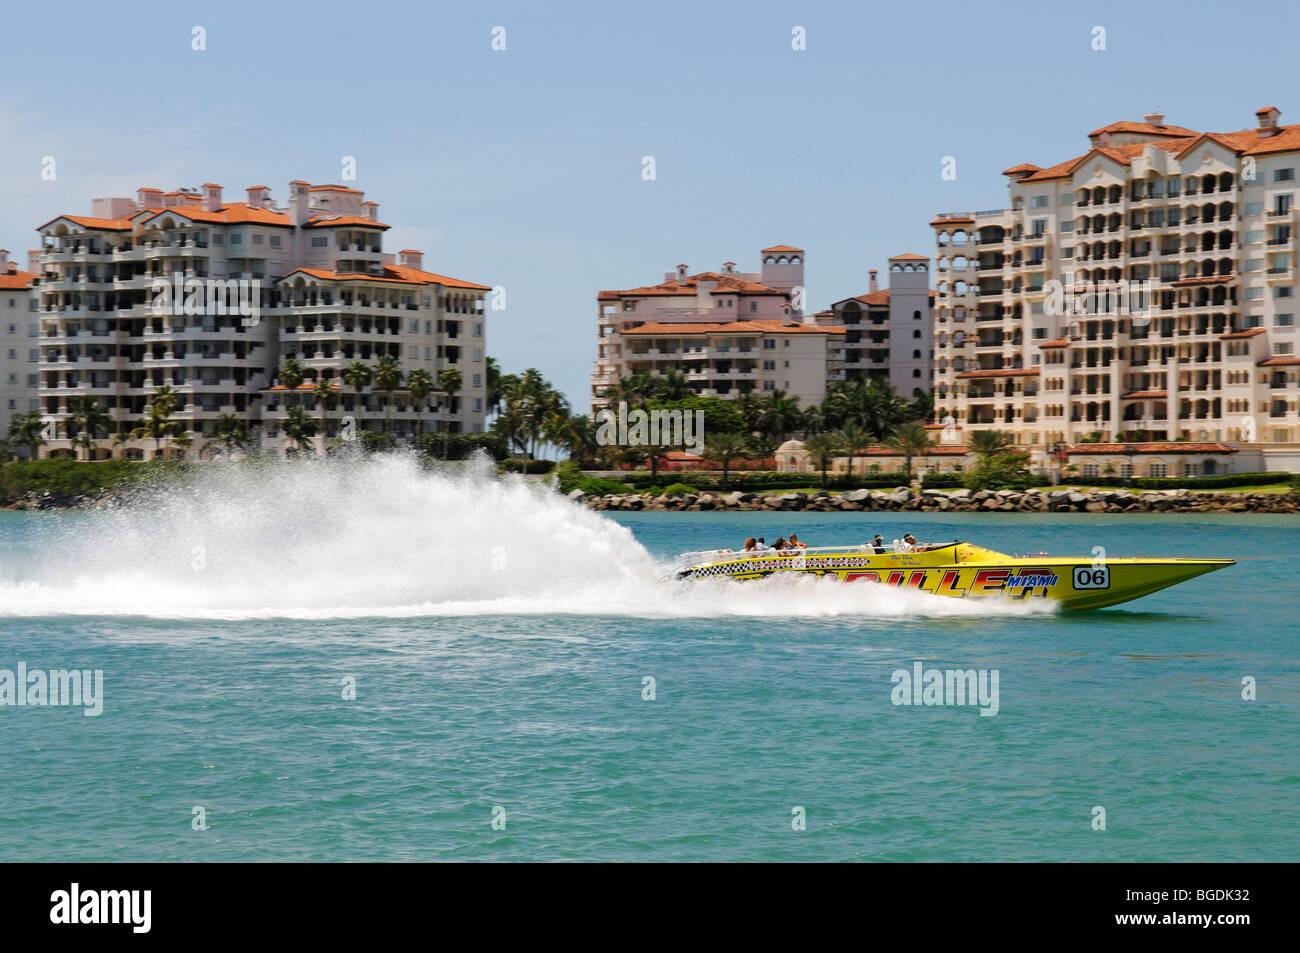 Speedboat, South Pointe Park, Miami South Beach, Florida, USA - Stock Image